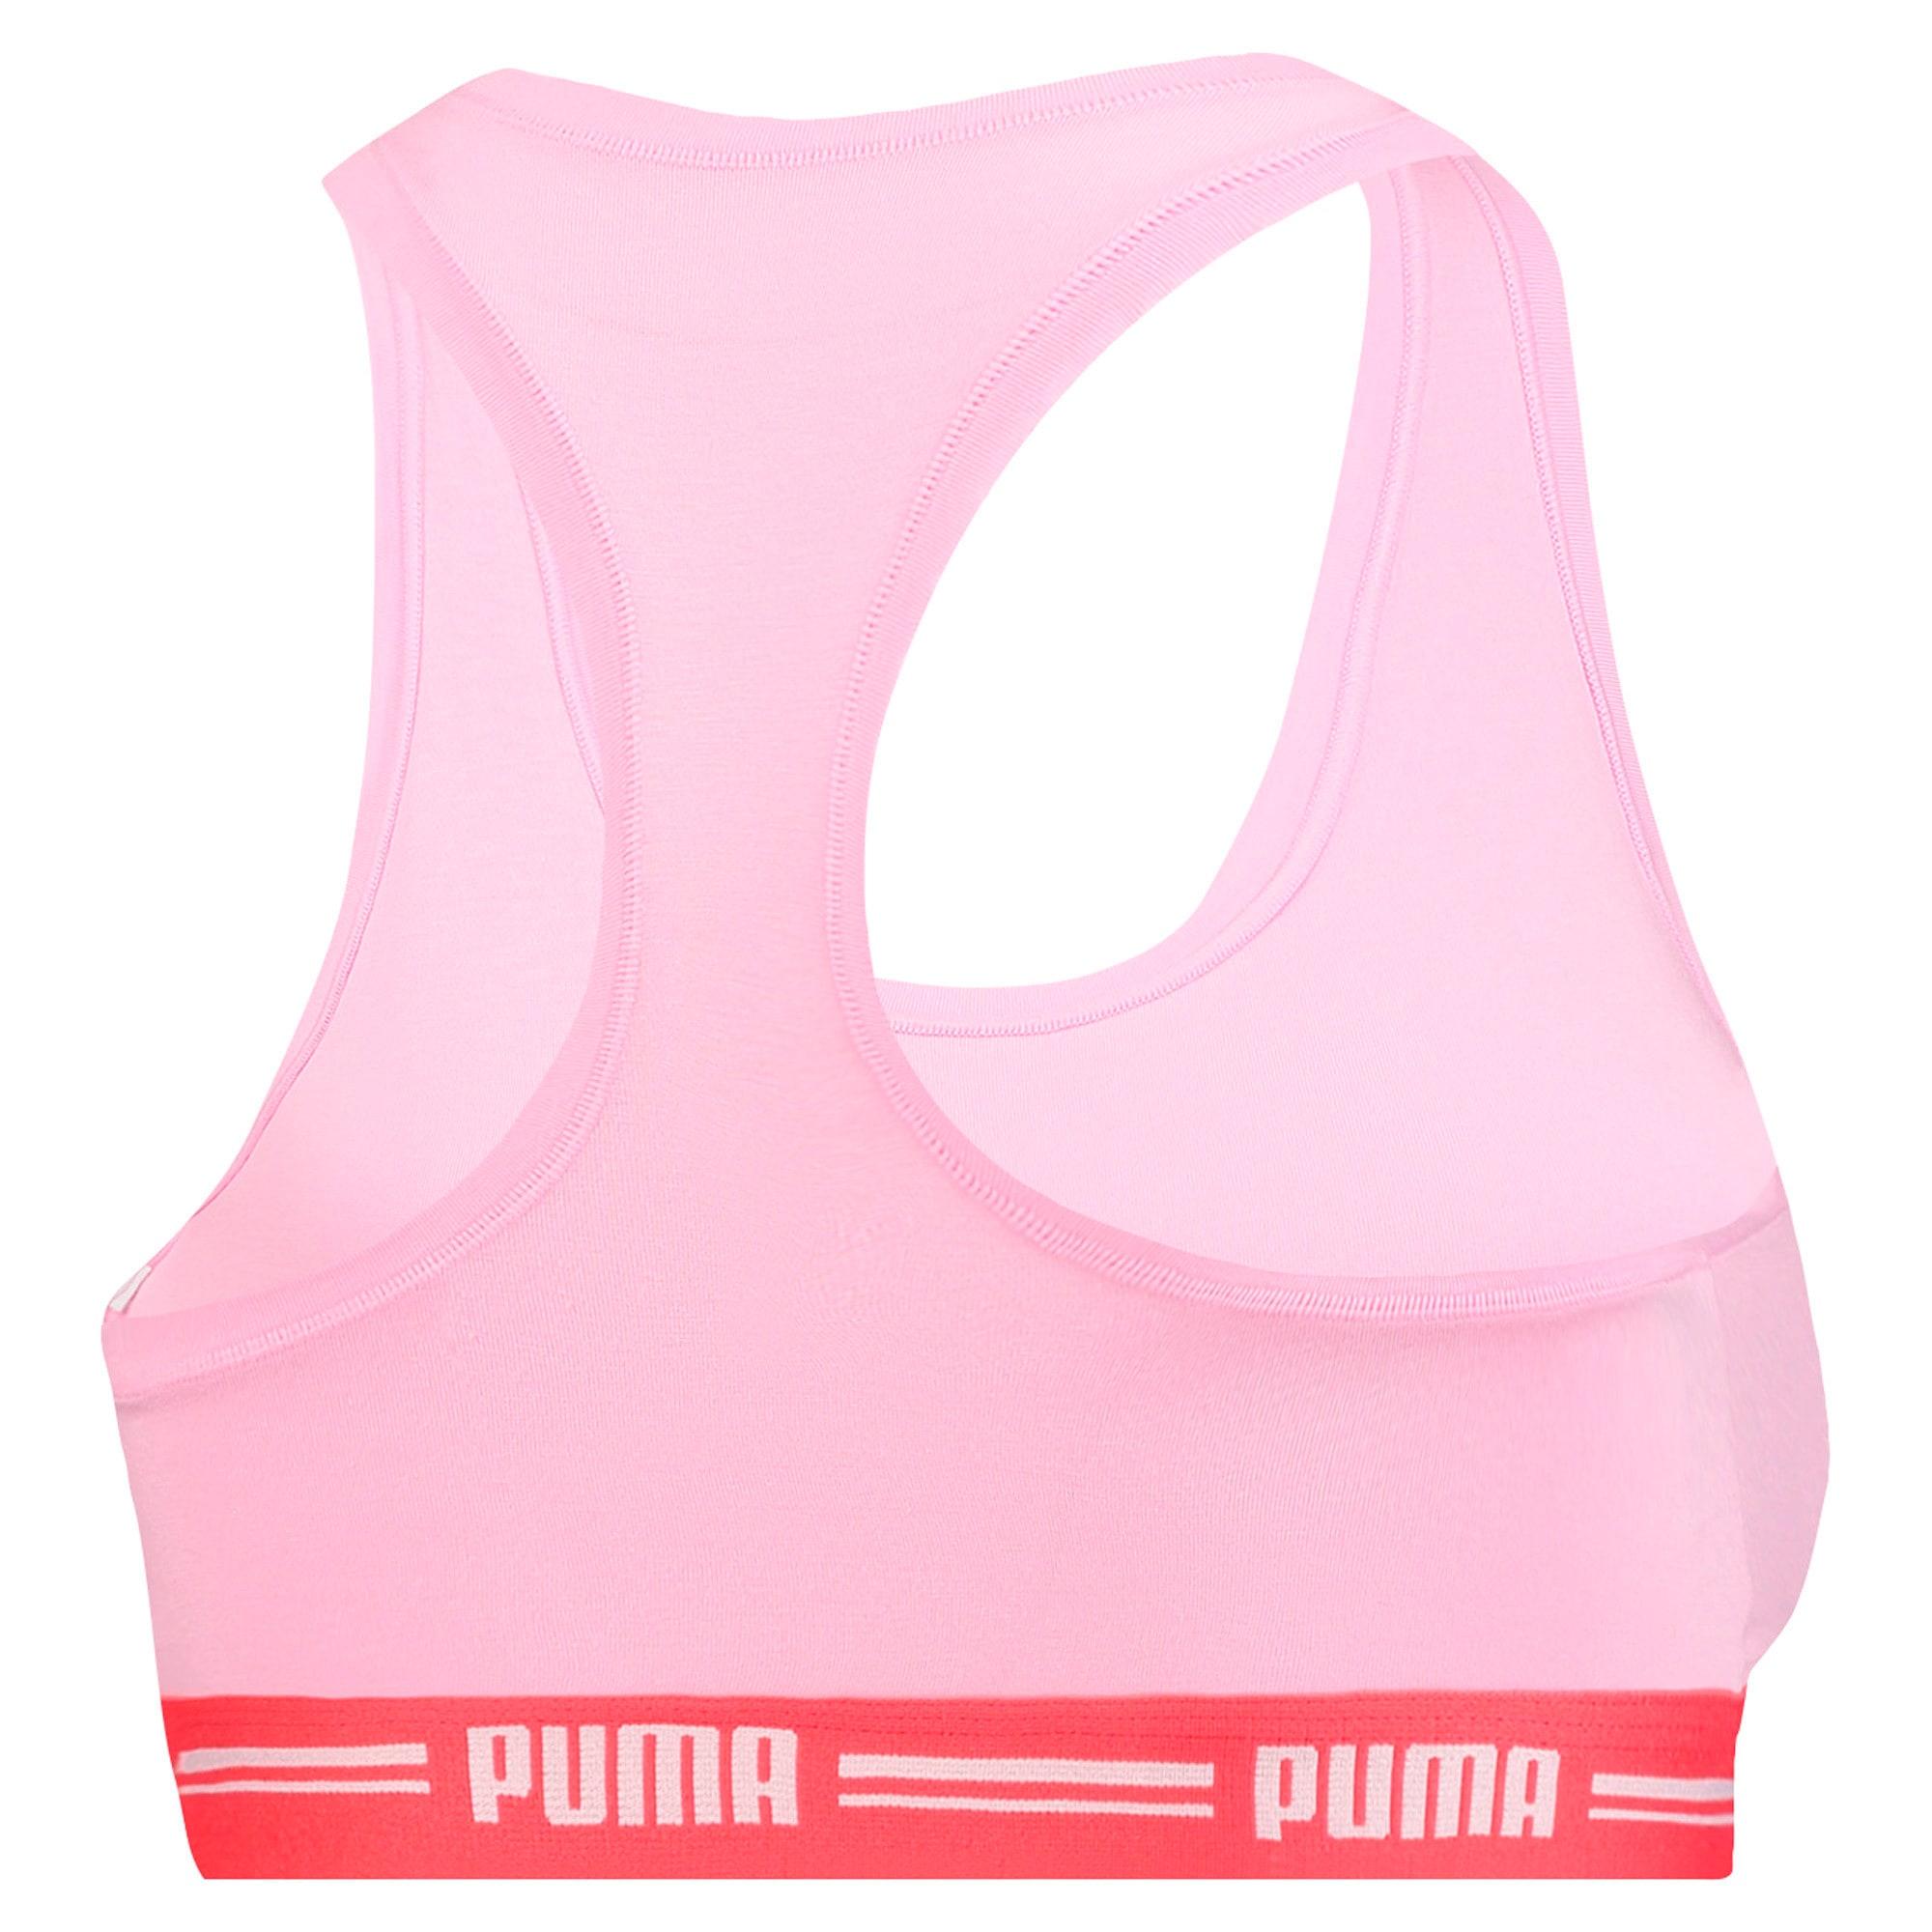 Thumbnail 2 of Iconic Racerback Women's Bra, pink / red, medium